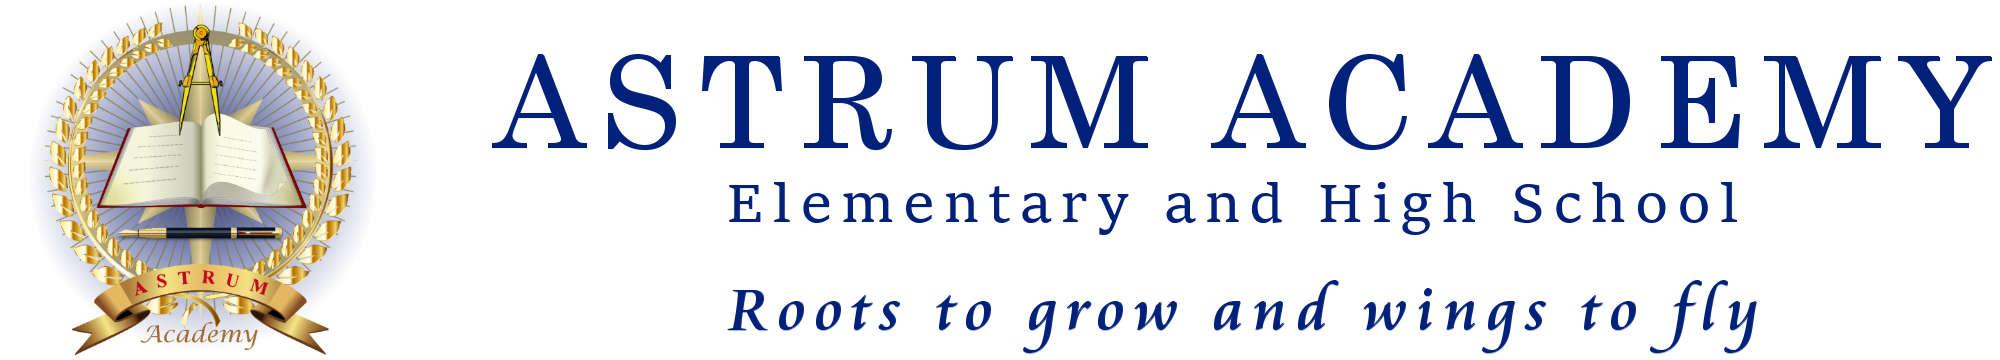 Astrum Academy